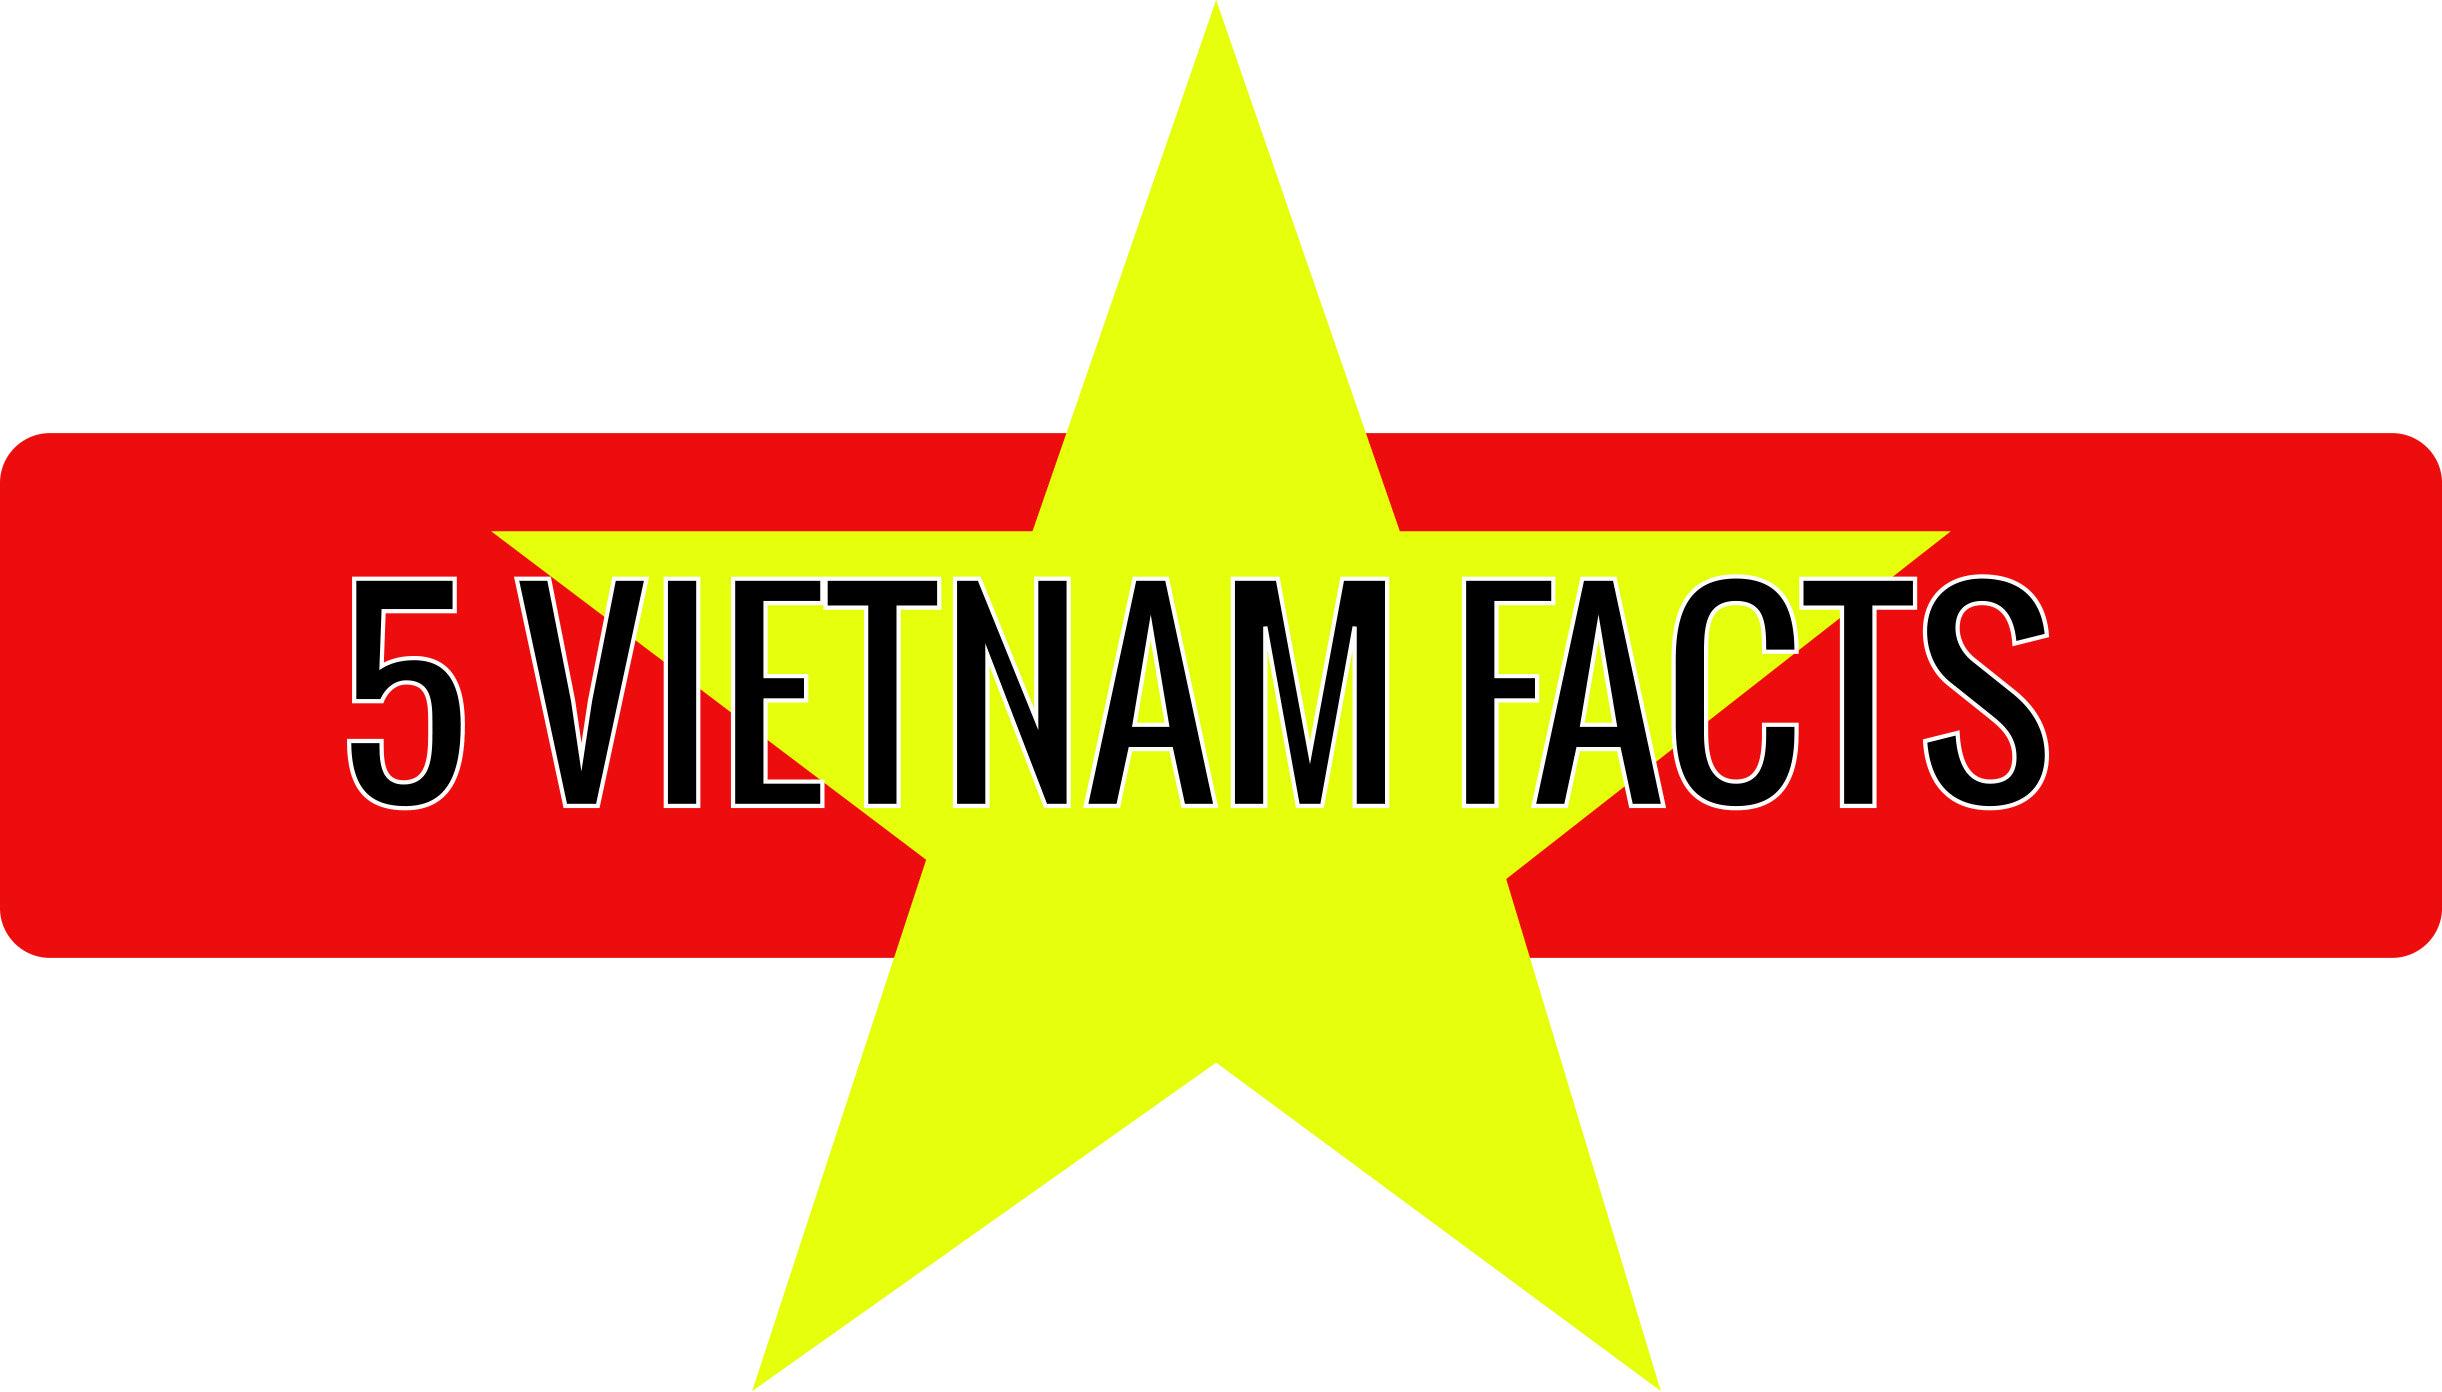 5 Vietnam Facts